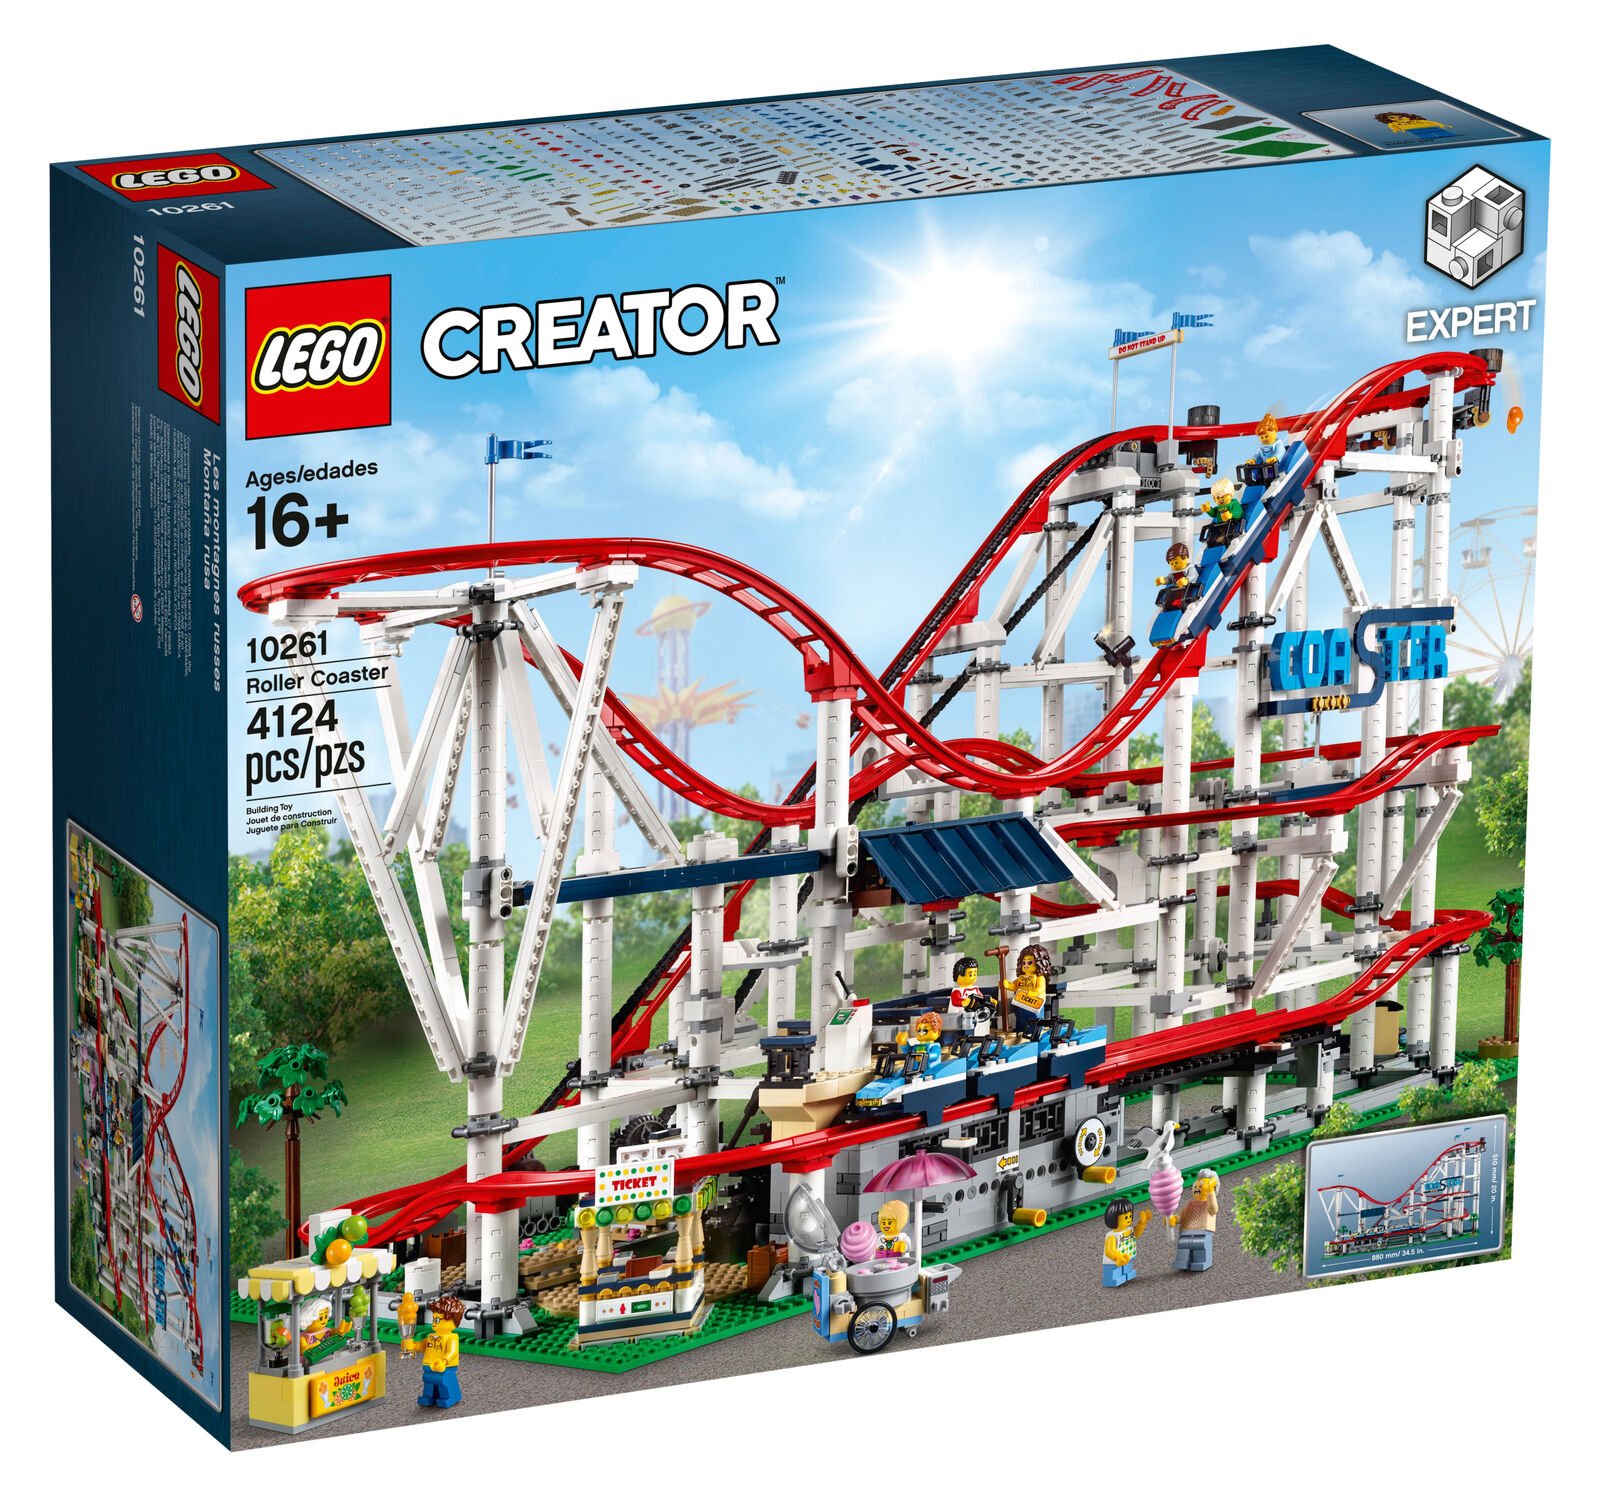 NEU Lego Creator Achterbahn 10261 Rollercoaster OVP – NEU